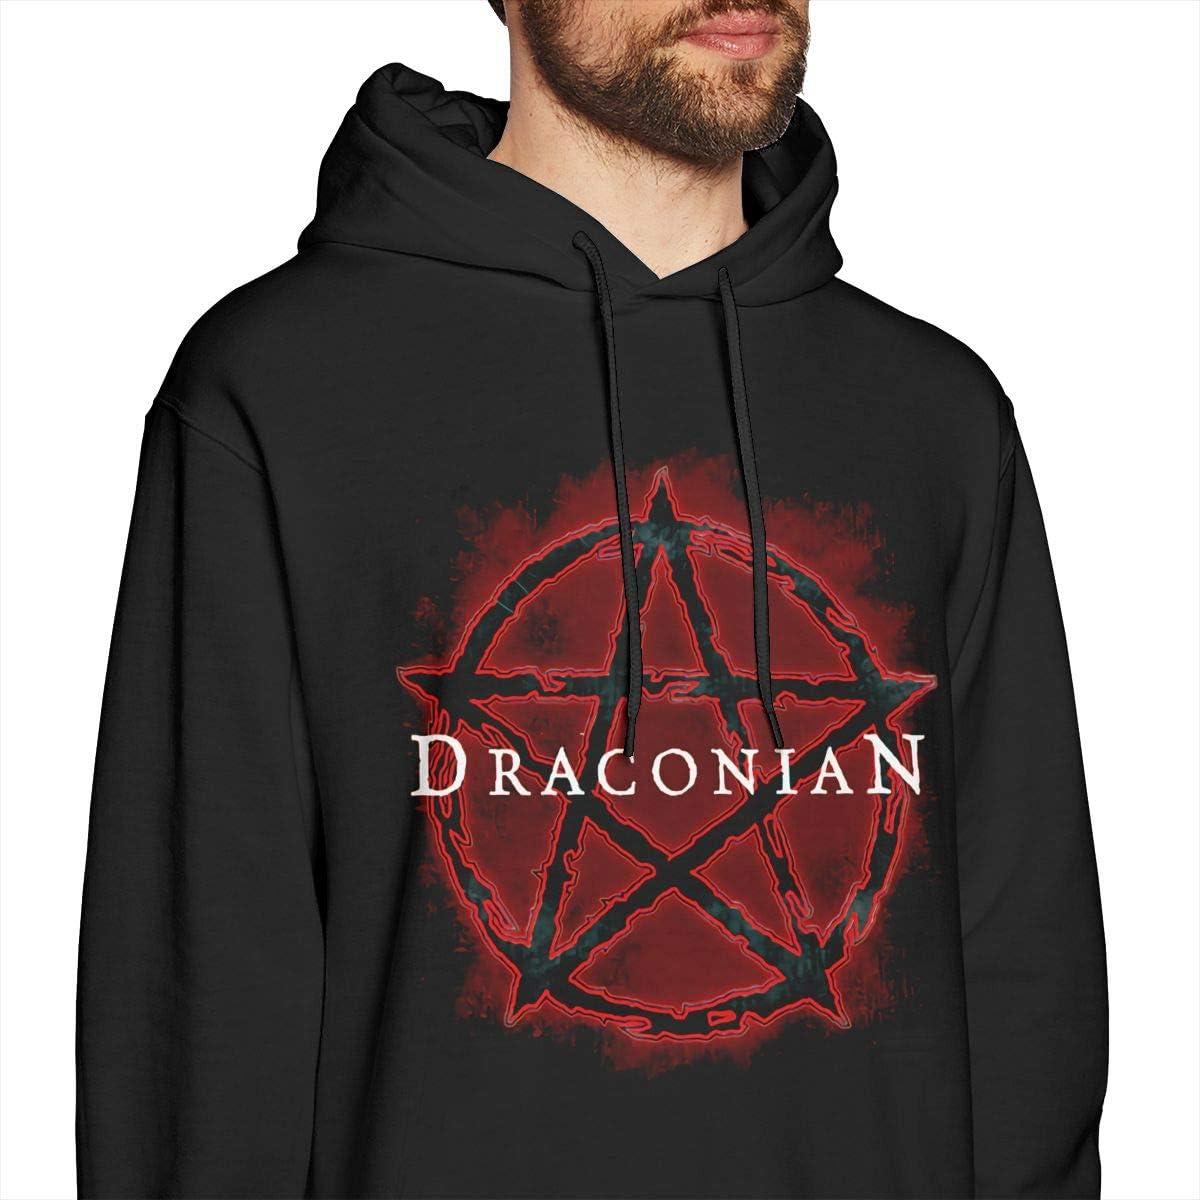 COURTNEY FRANCIS Draconian Cool Mens Long Sleeve Sweatshirts Mens Hoodies Black